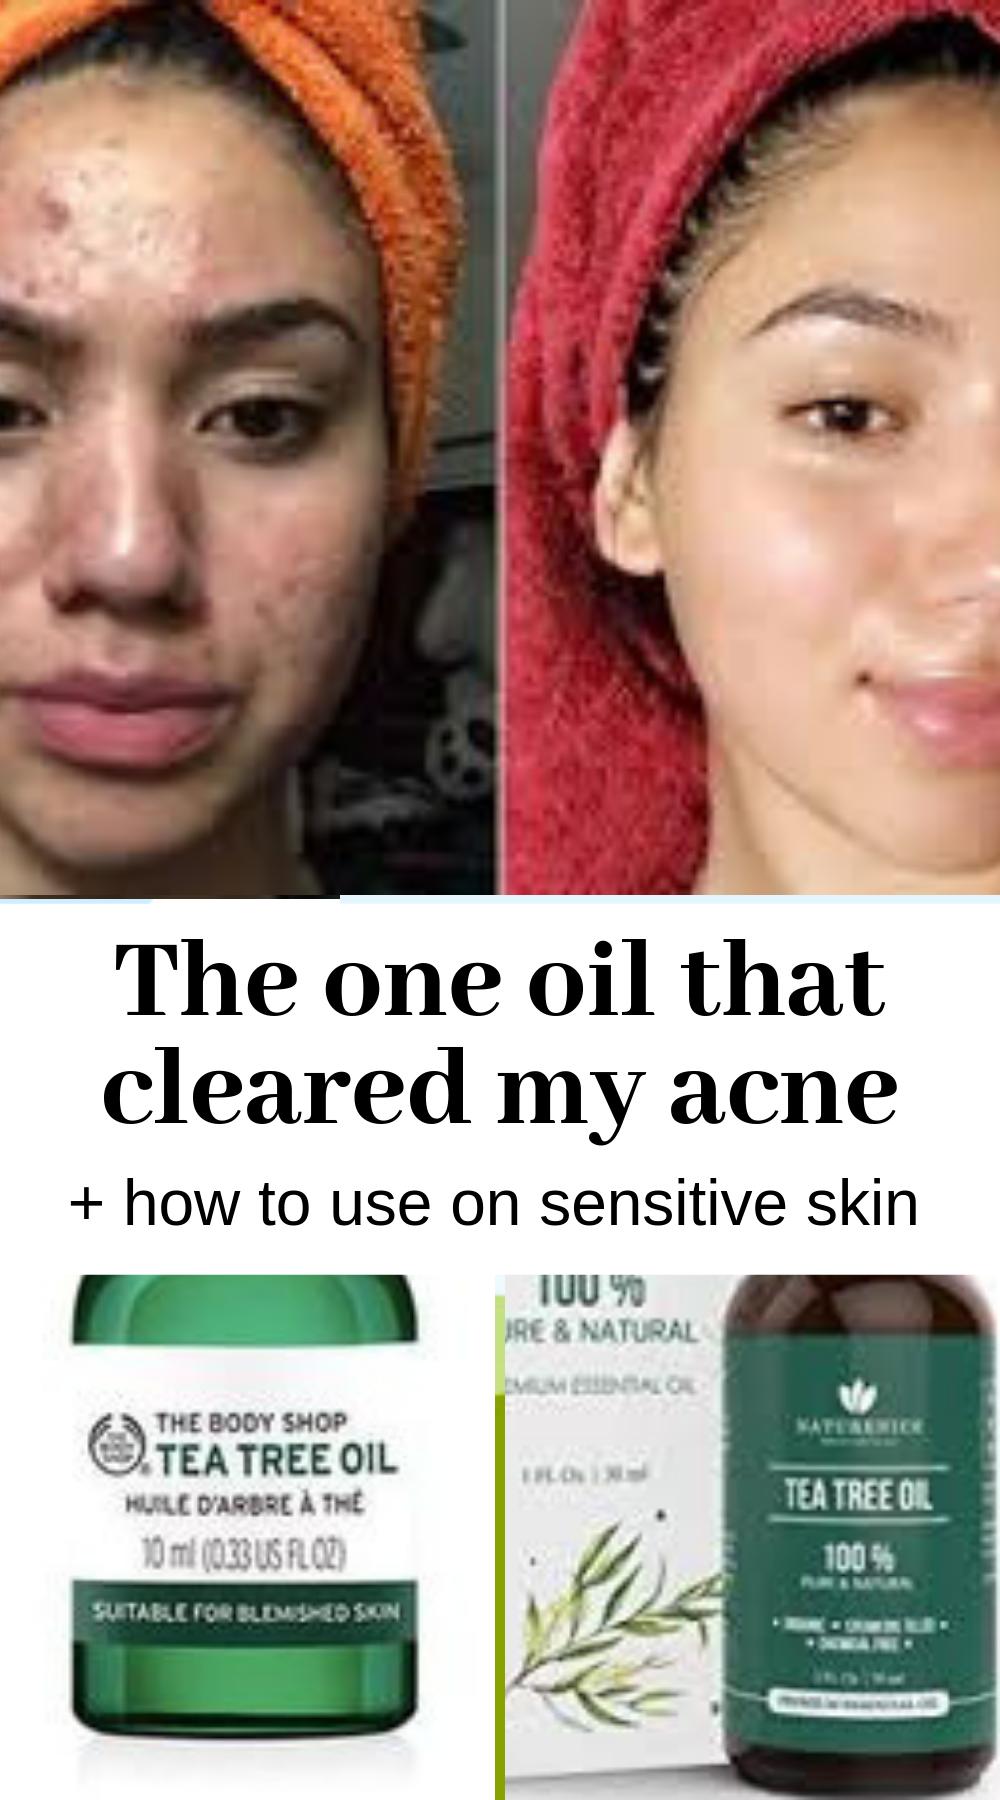 Use tea tree oil on acne, to get rid of pimples + Diy tea tree recipe: clear face tips -   13 skin care Acne tea tree ideas